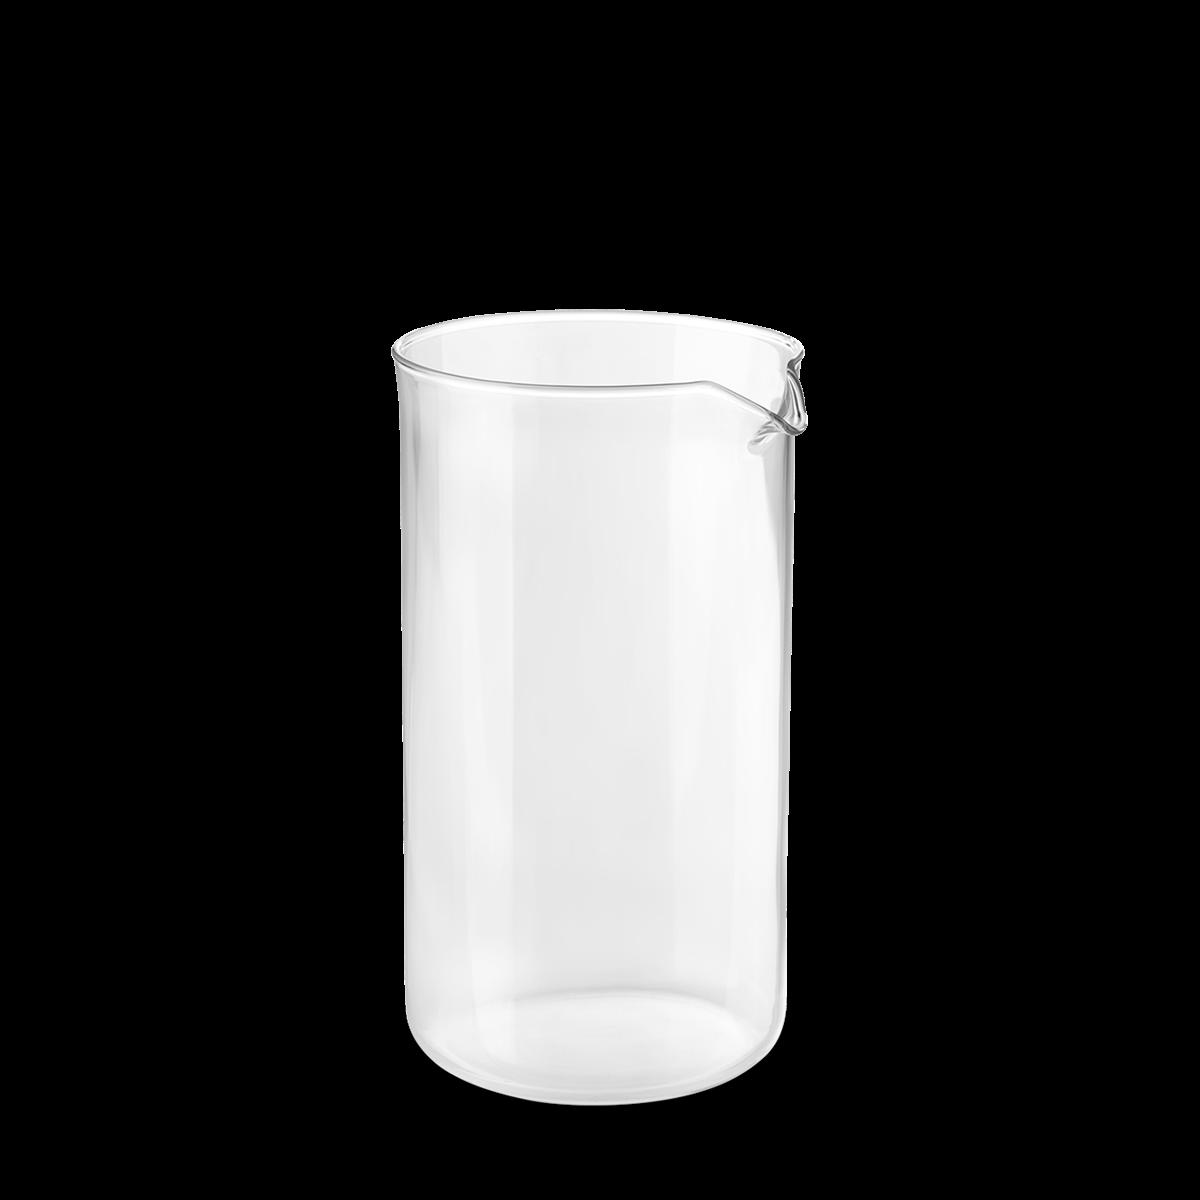 Coffee plunger glass 1 L klar